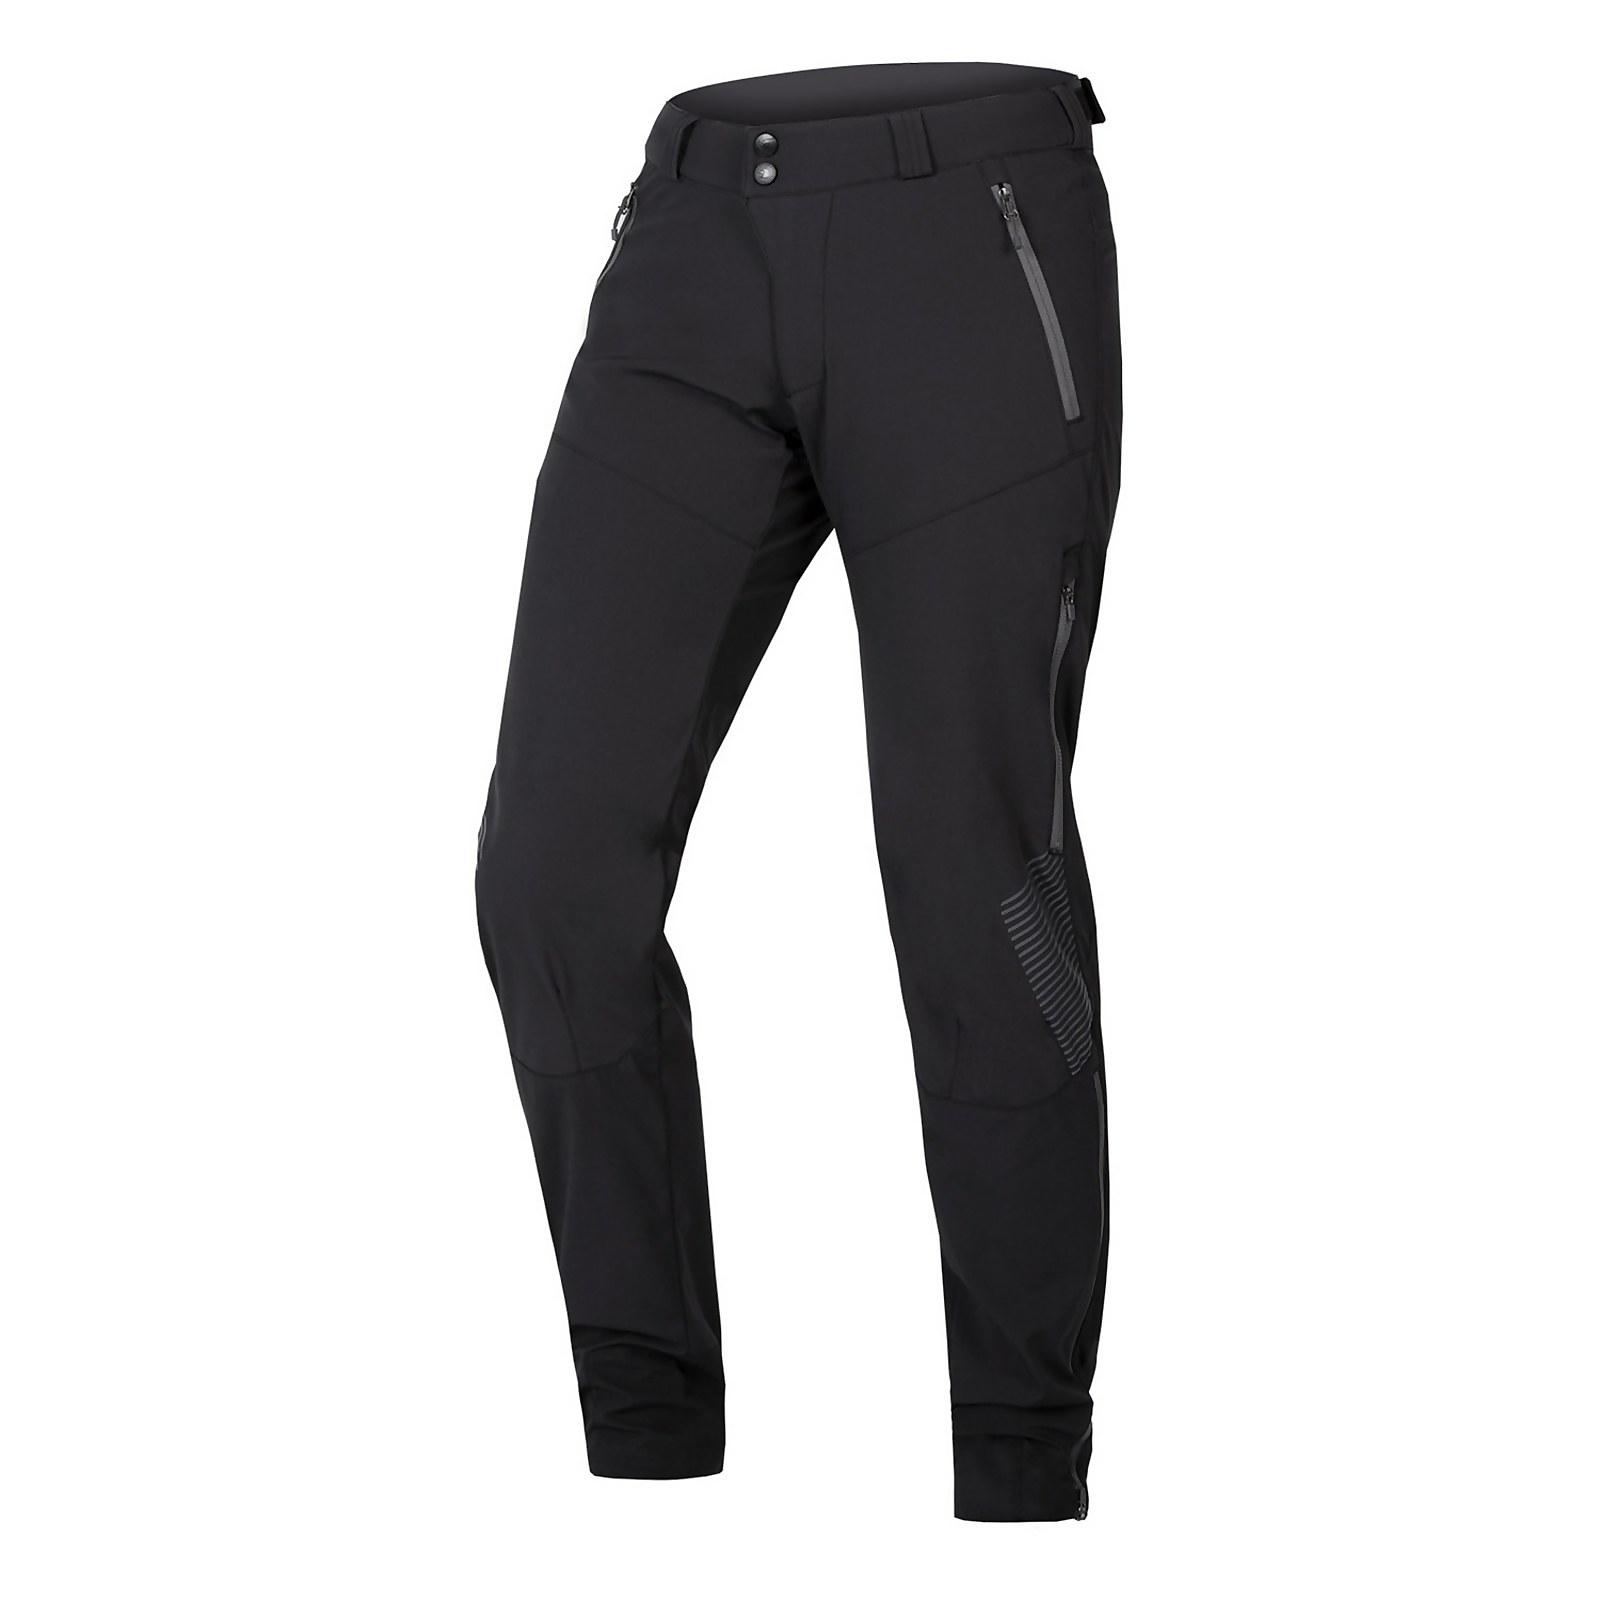 Womens Mt500 Spray Baggy Trouser Ii - Black - L